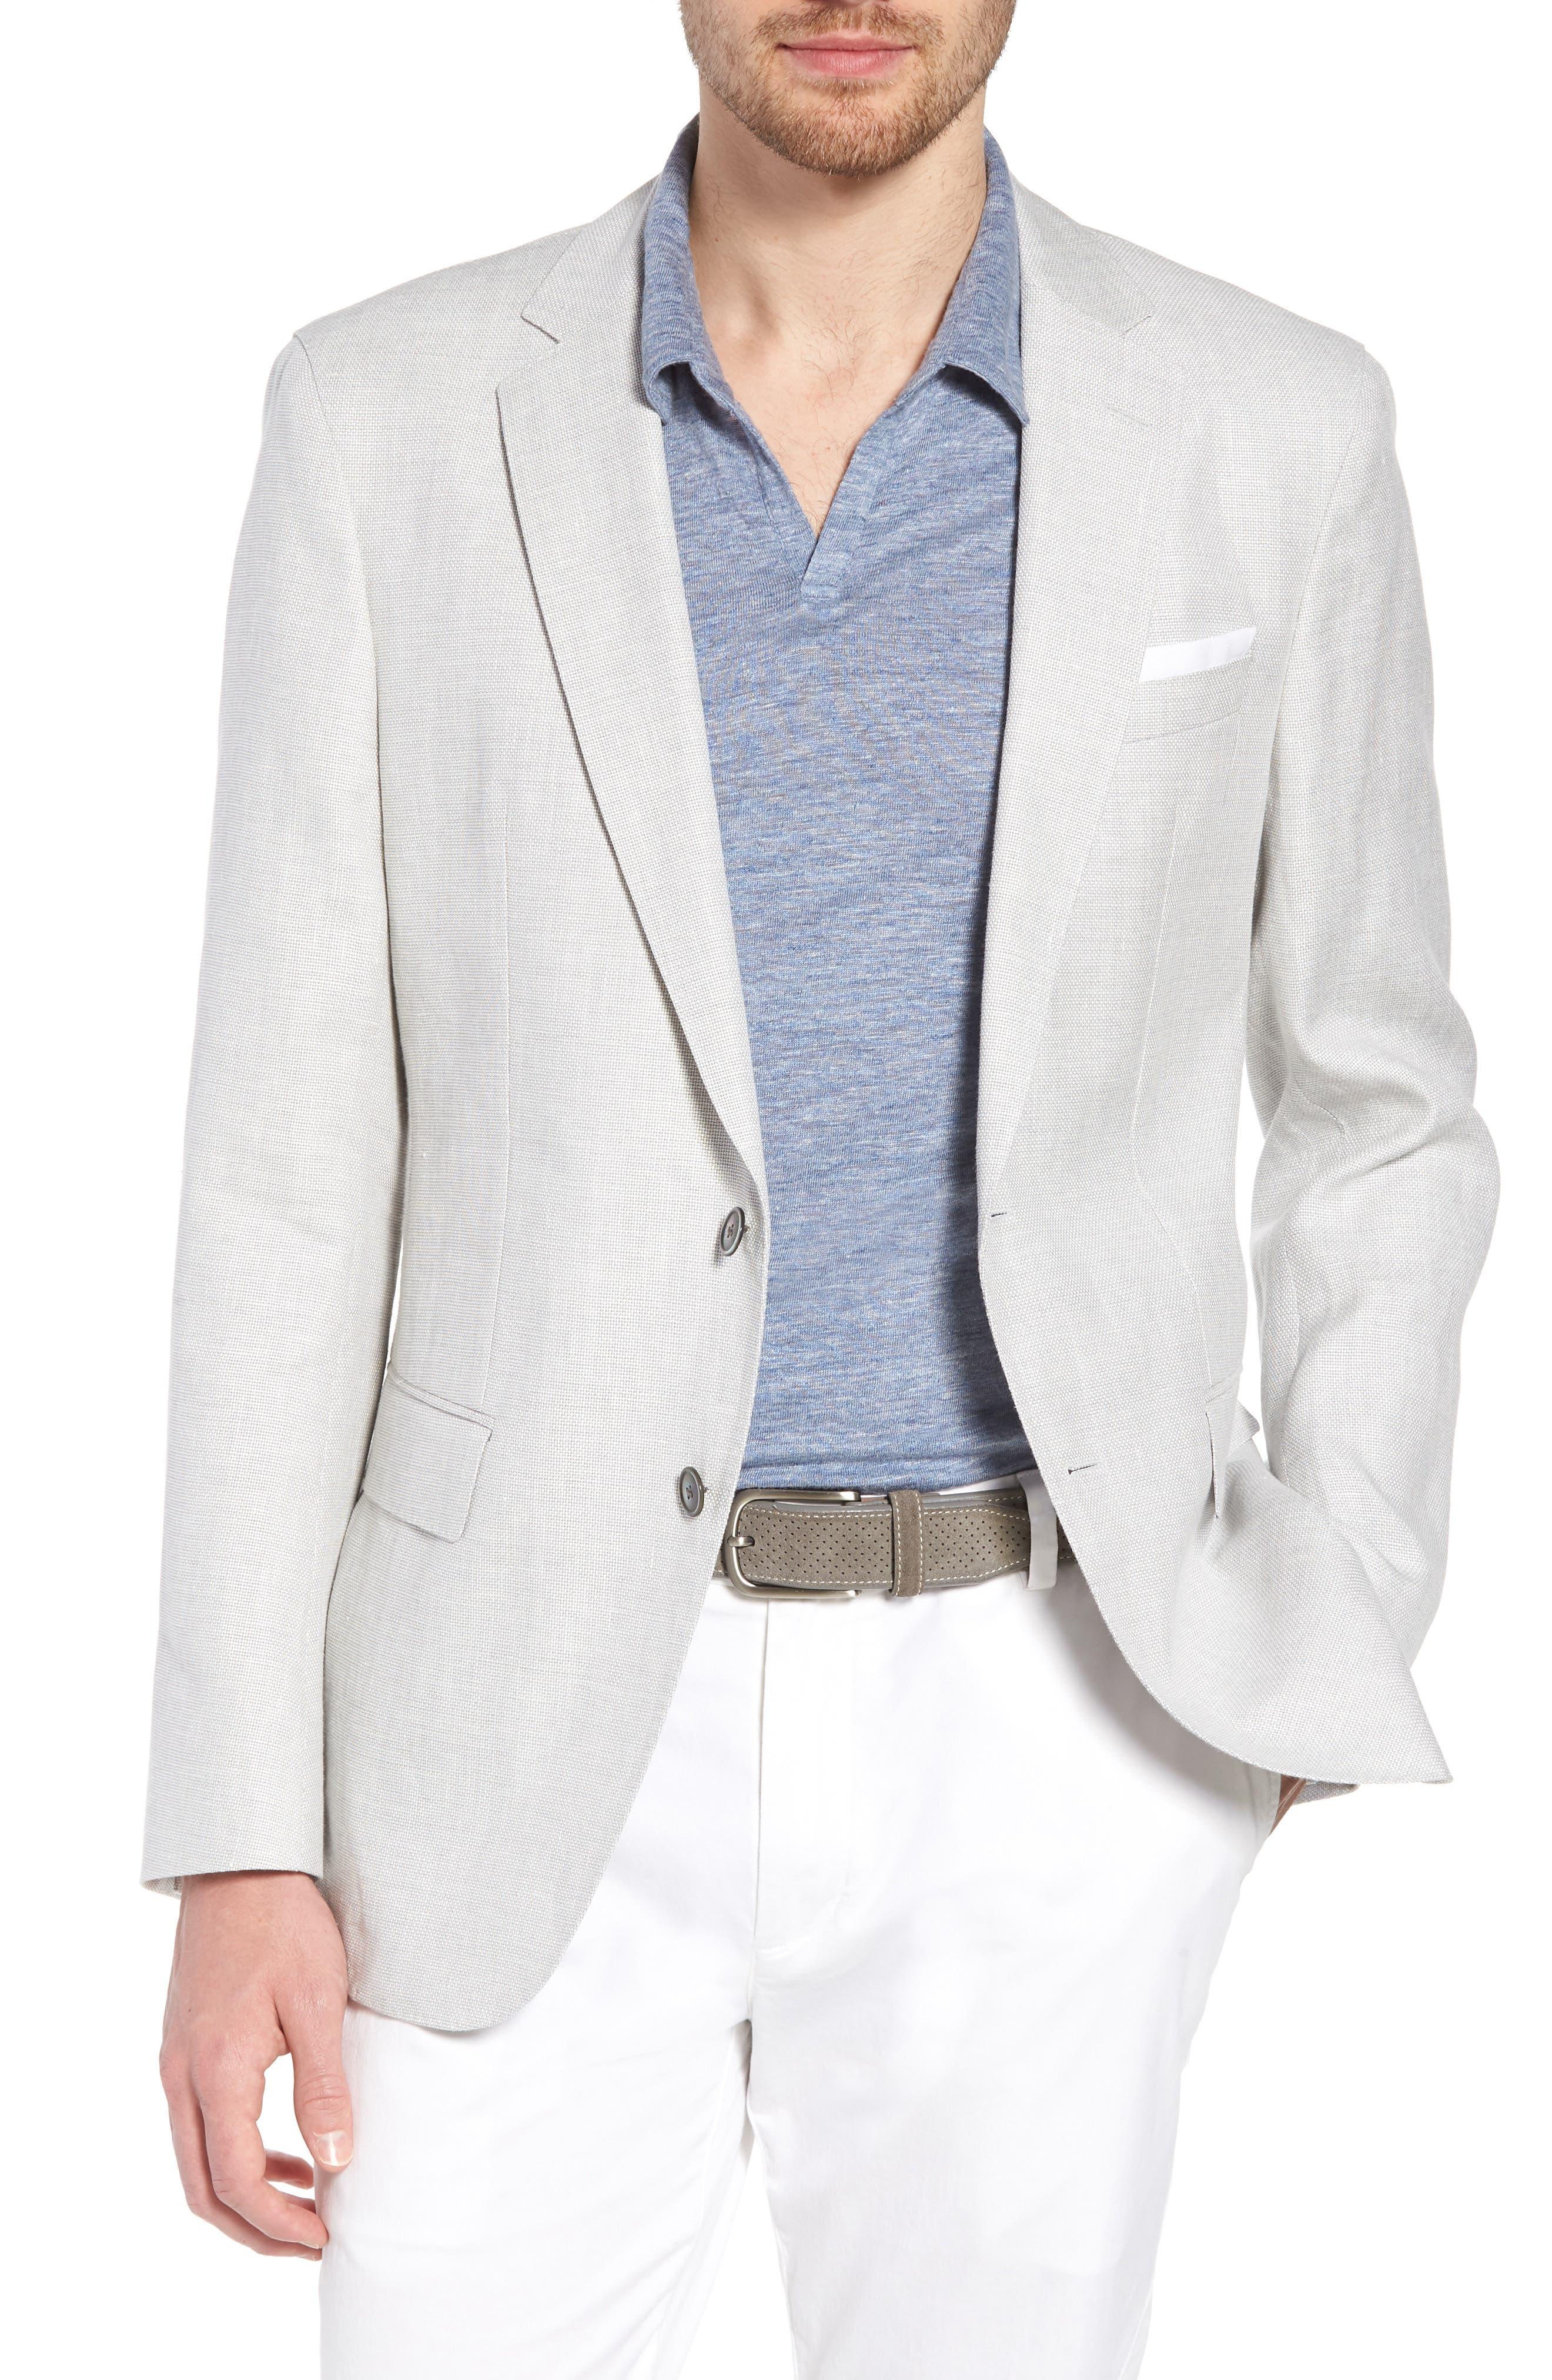 Hartlay Trim Fit Linen Blend Blazer,                         Main,                         color, Silver Grey